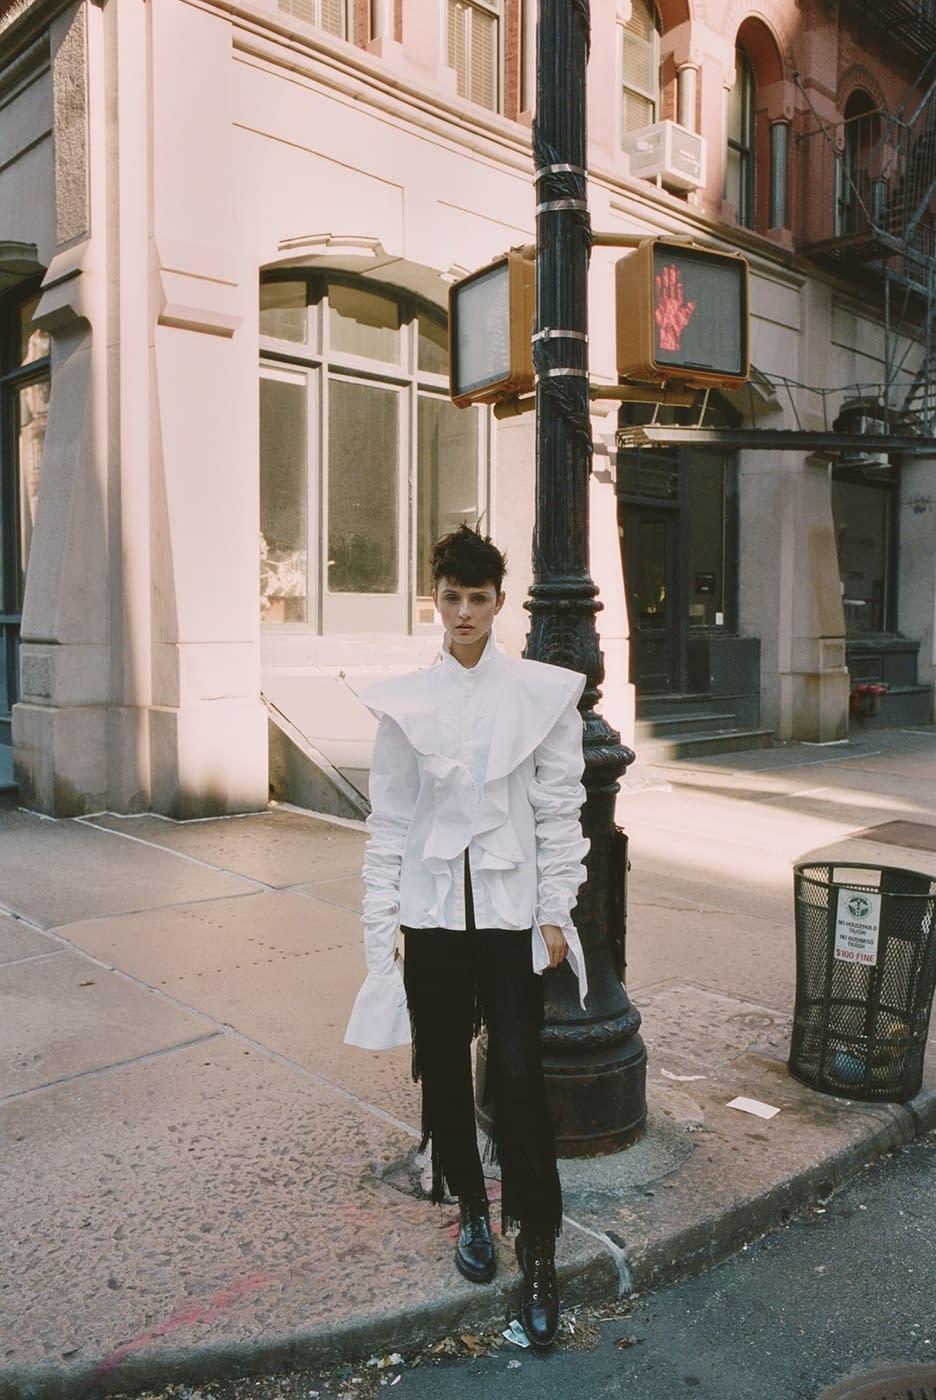 New York Stories 2 photo Enric Galceran - 19